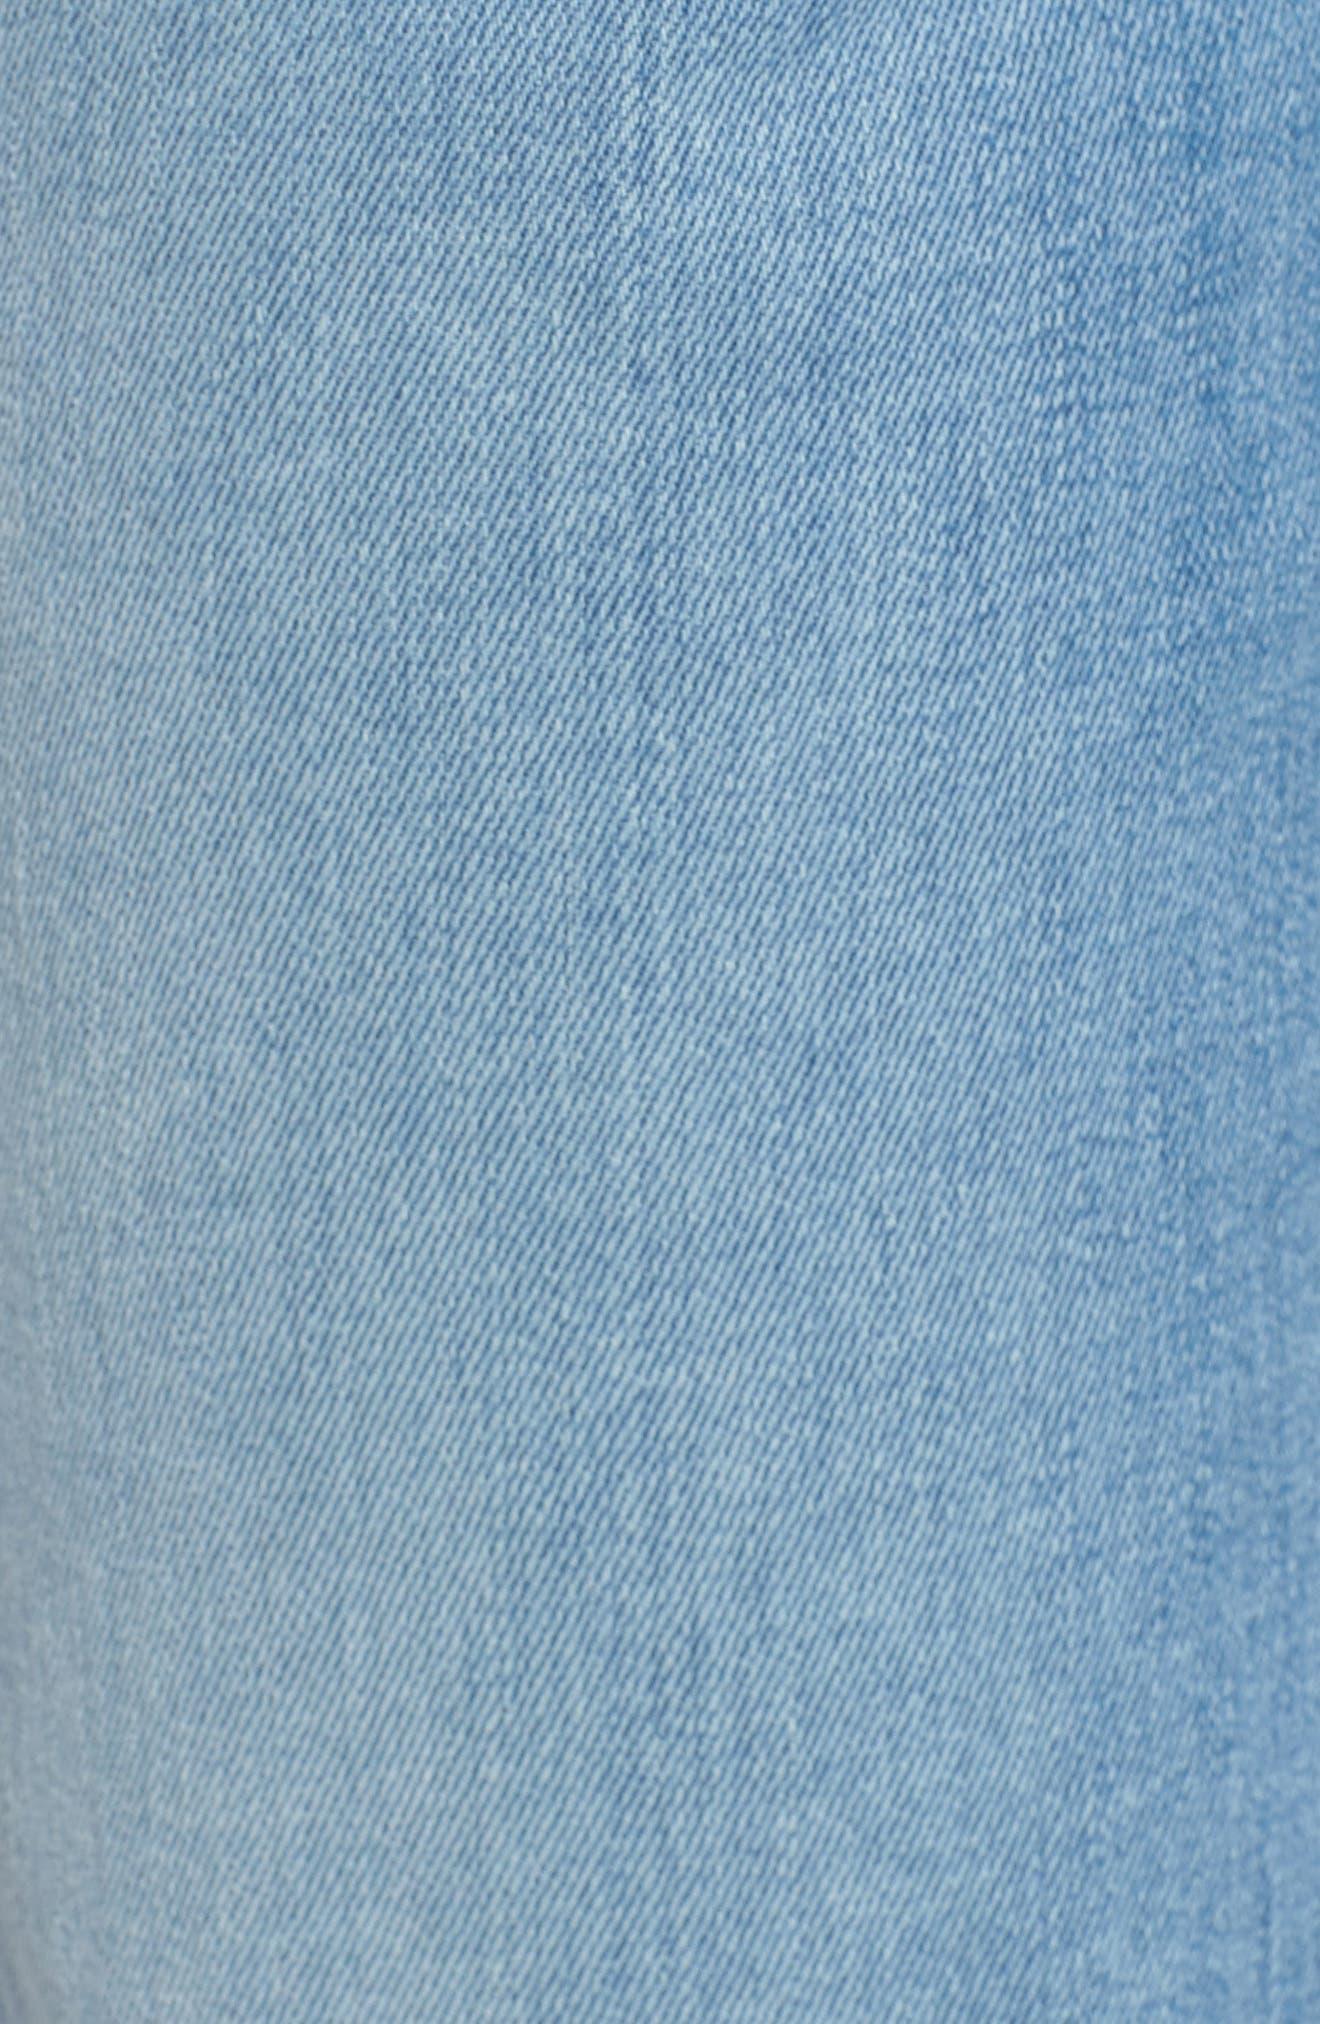 A-Pocket Flare Leg Jeans,                             Alternate thumbnail 6, color,                             Bright Palms